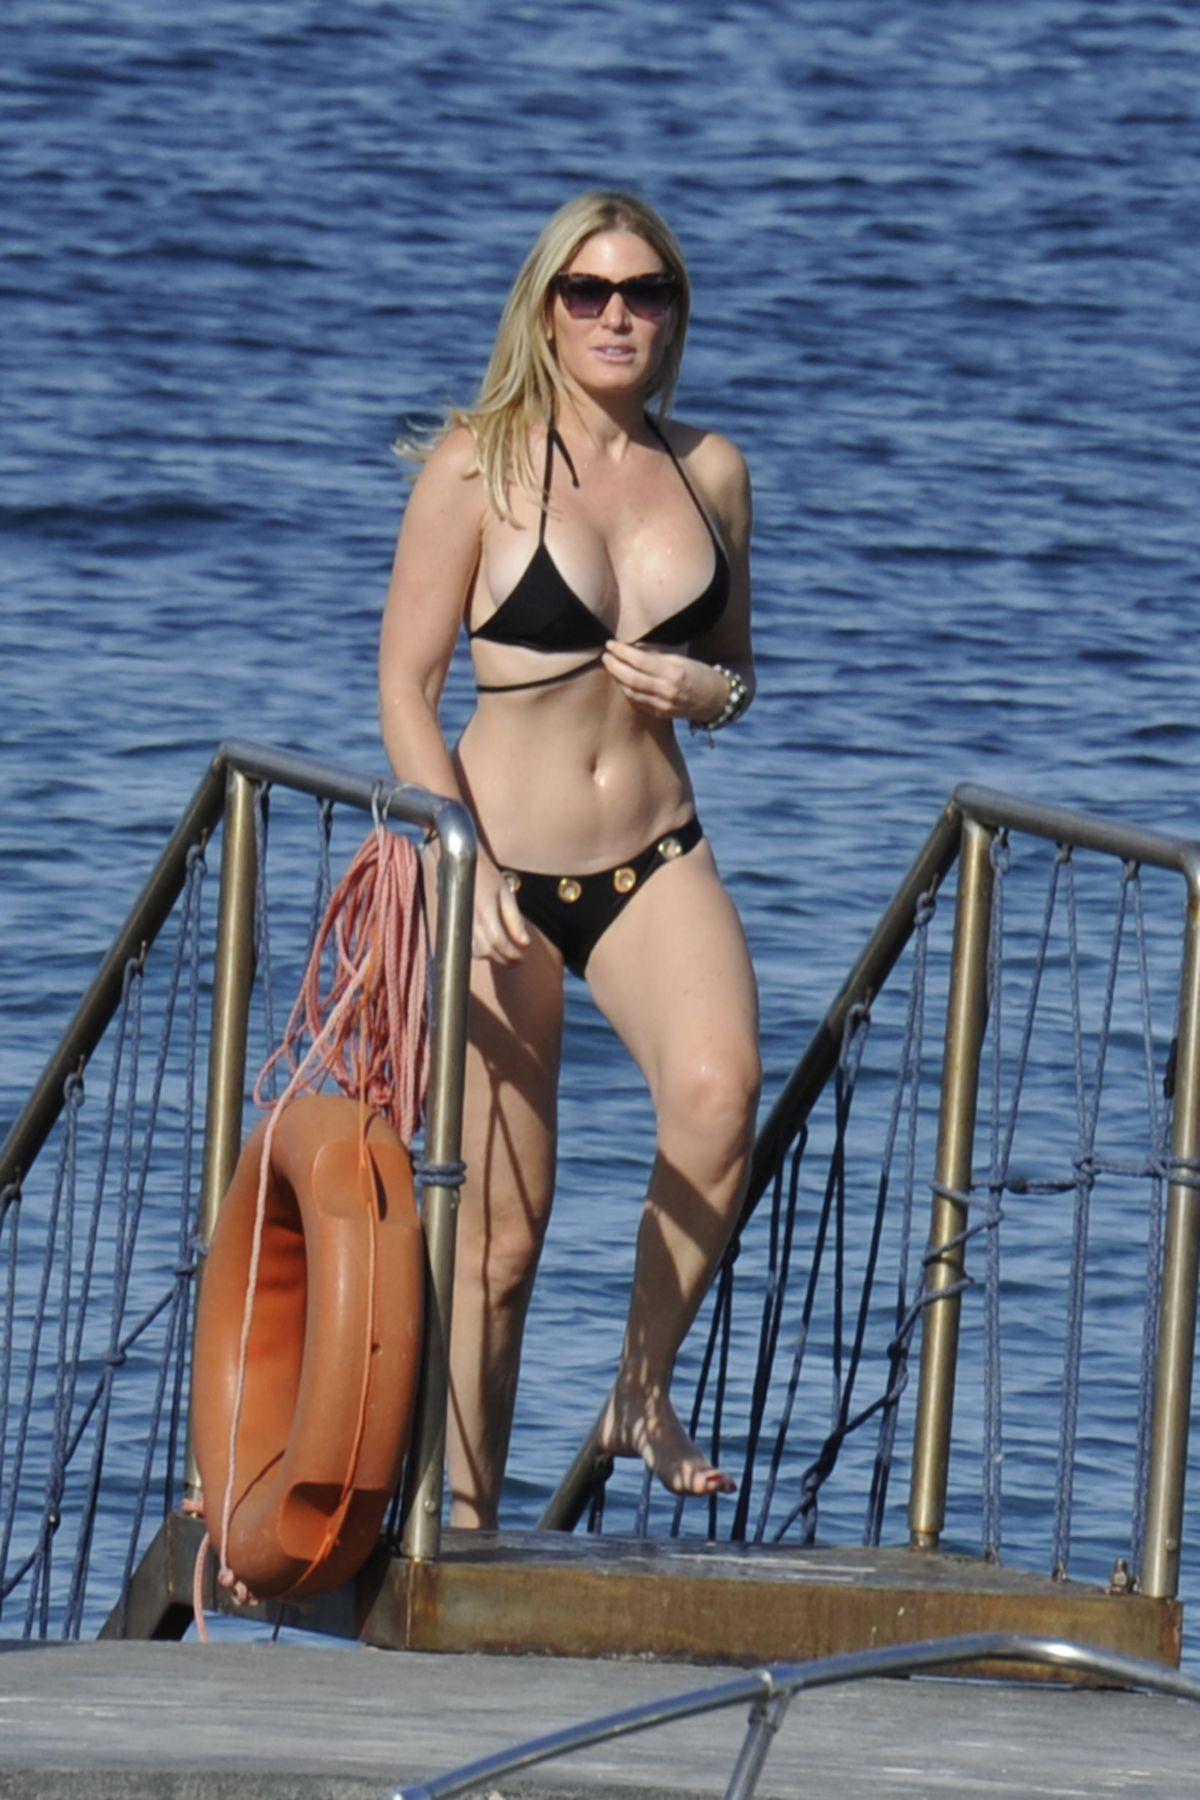 Bikini Hofit Golan nudes (12 images), Paparazzi